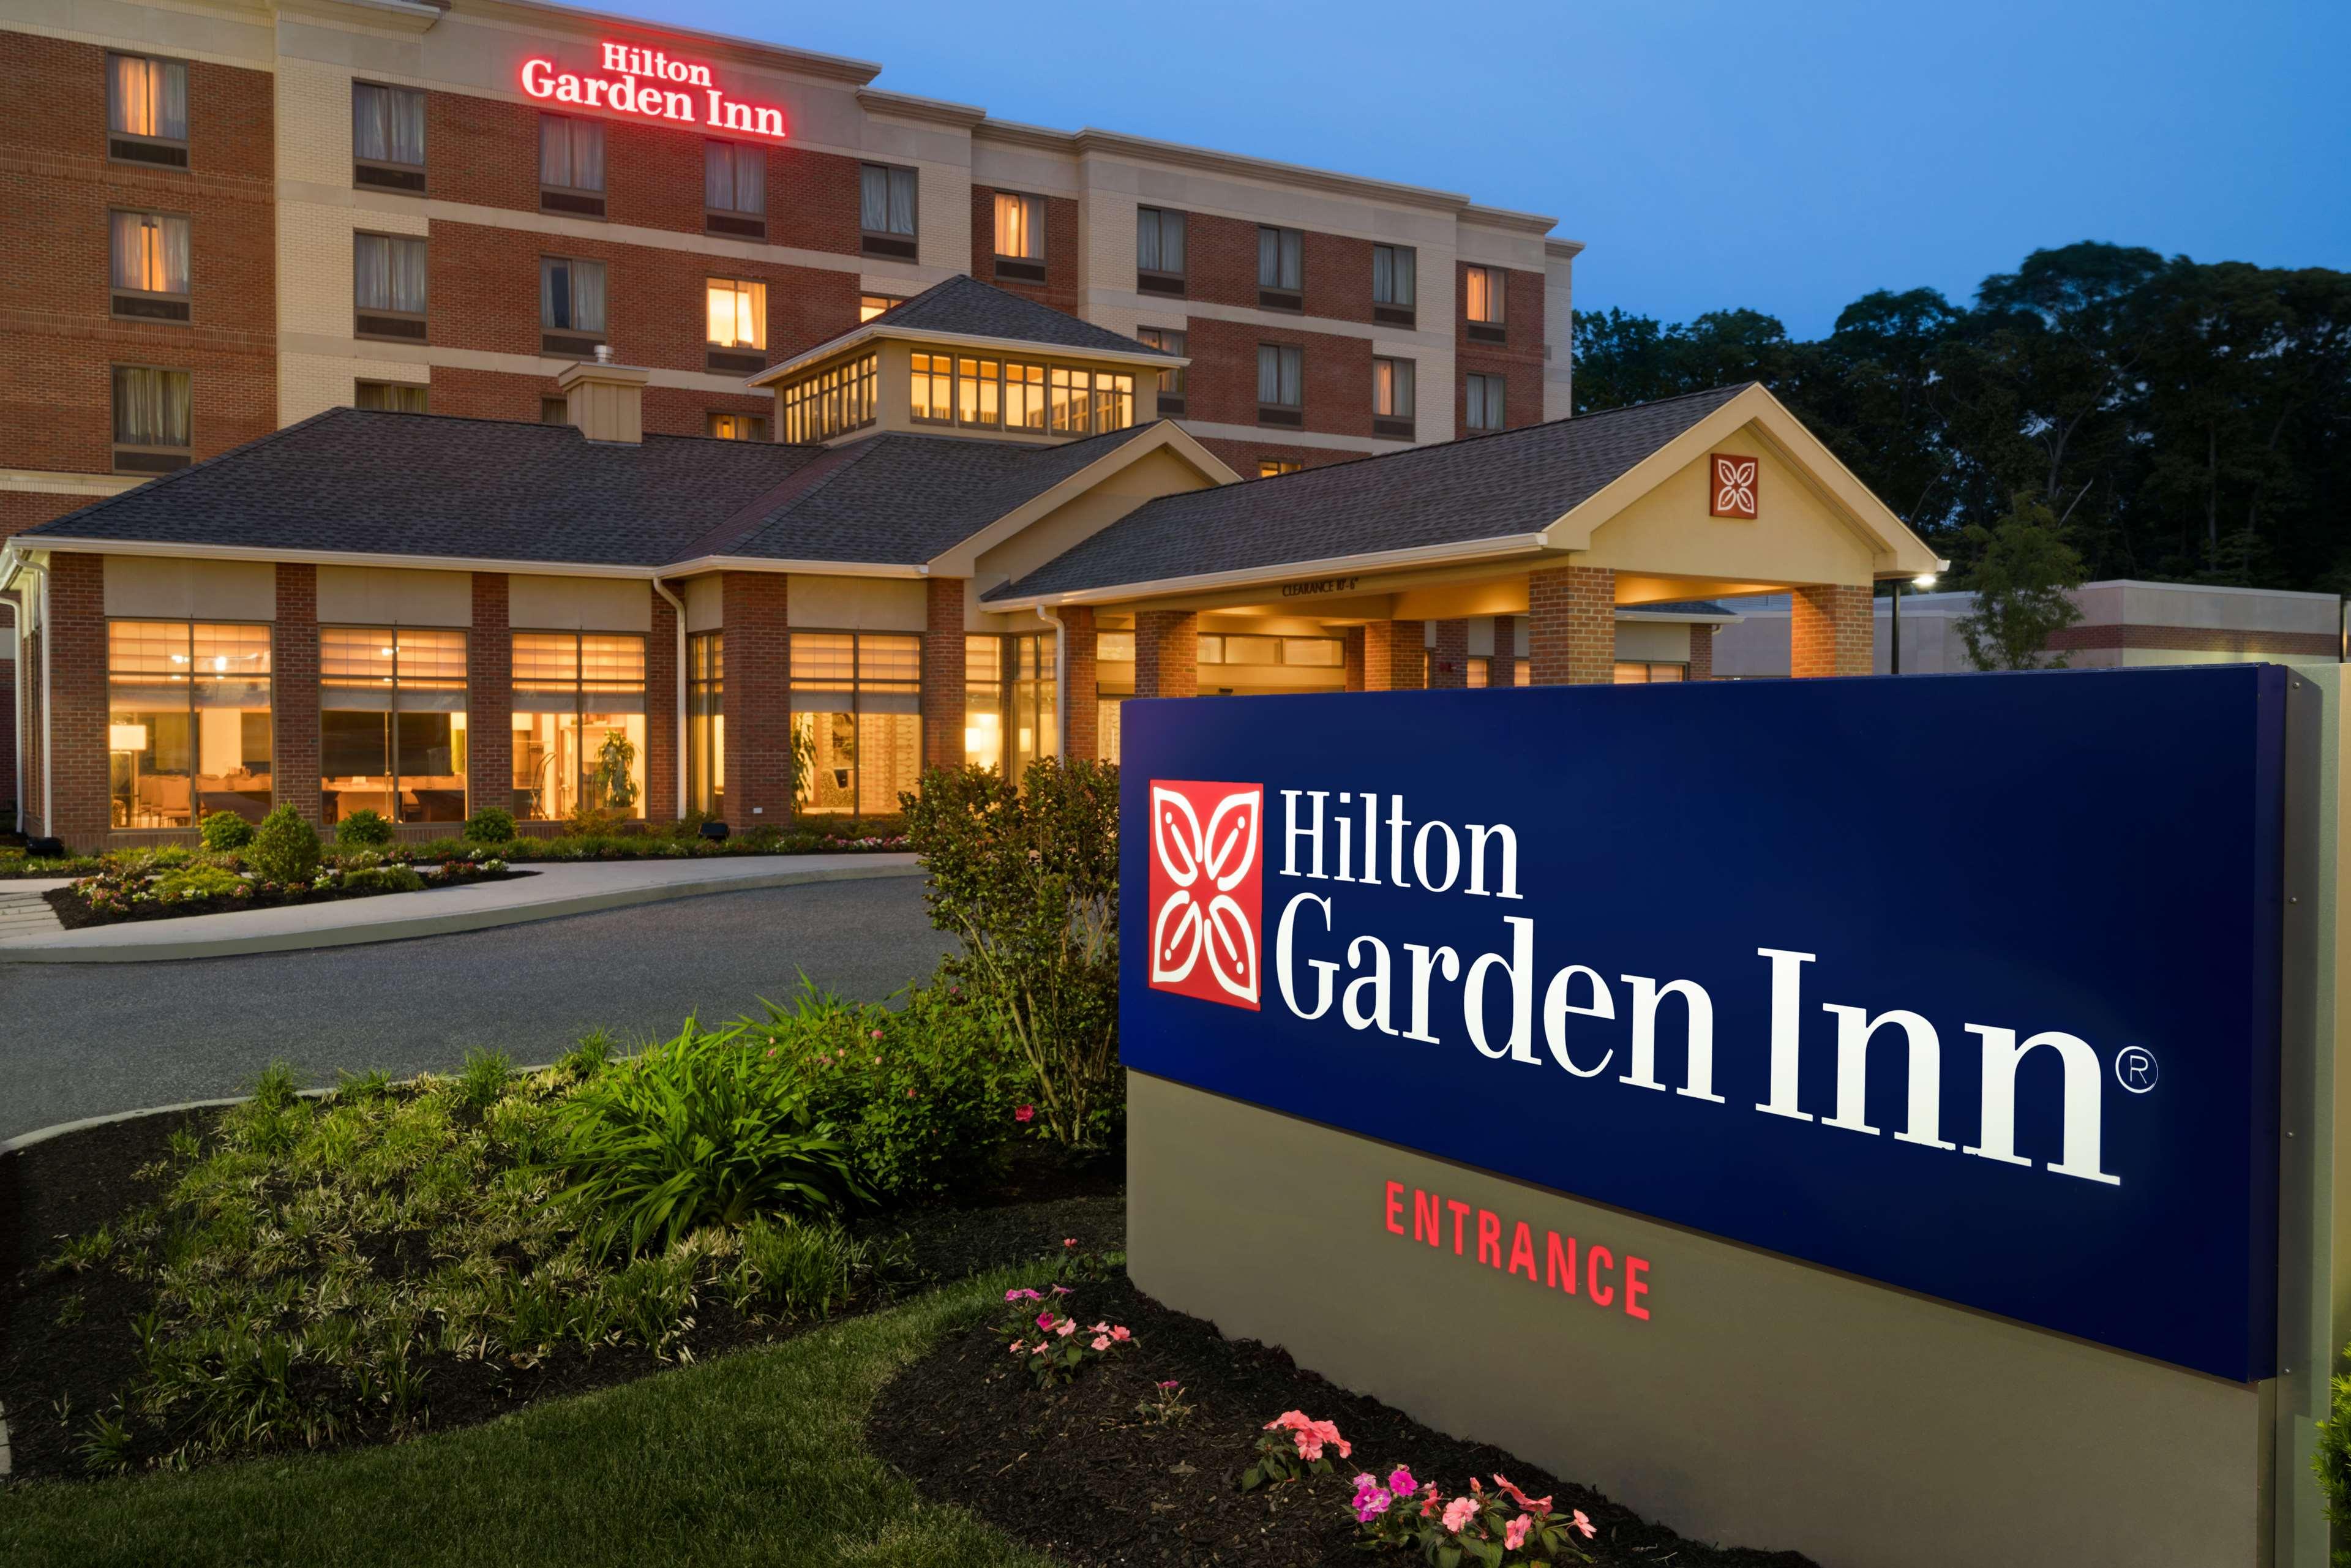 Hilton garden inn stony brook 1 circle road stony brook ny hotels motels mapquest Stony brook swimming pool hours